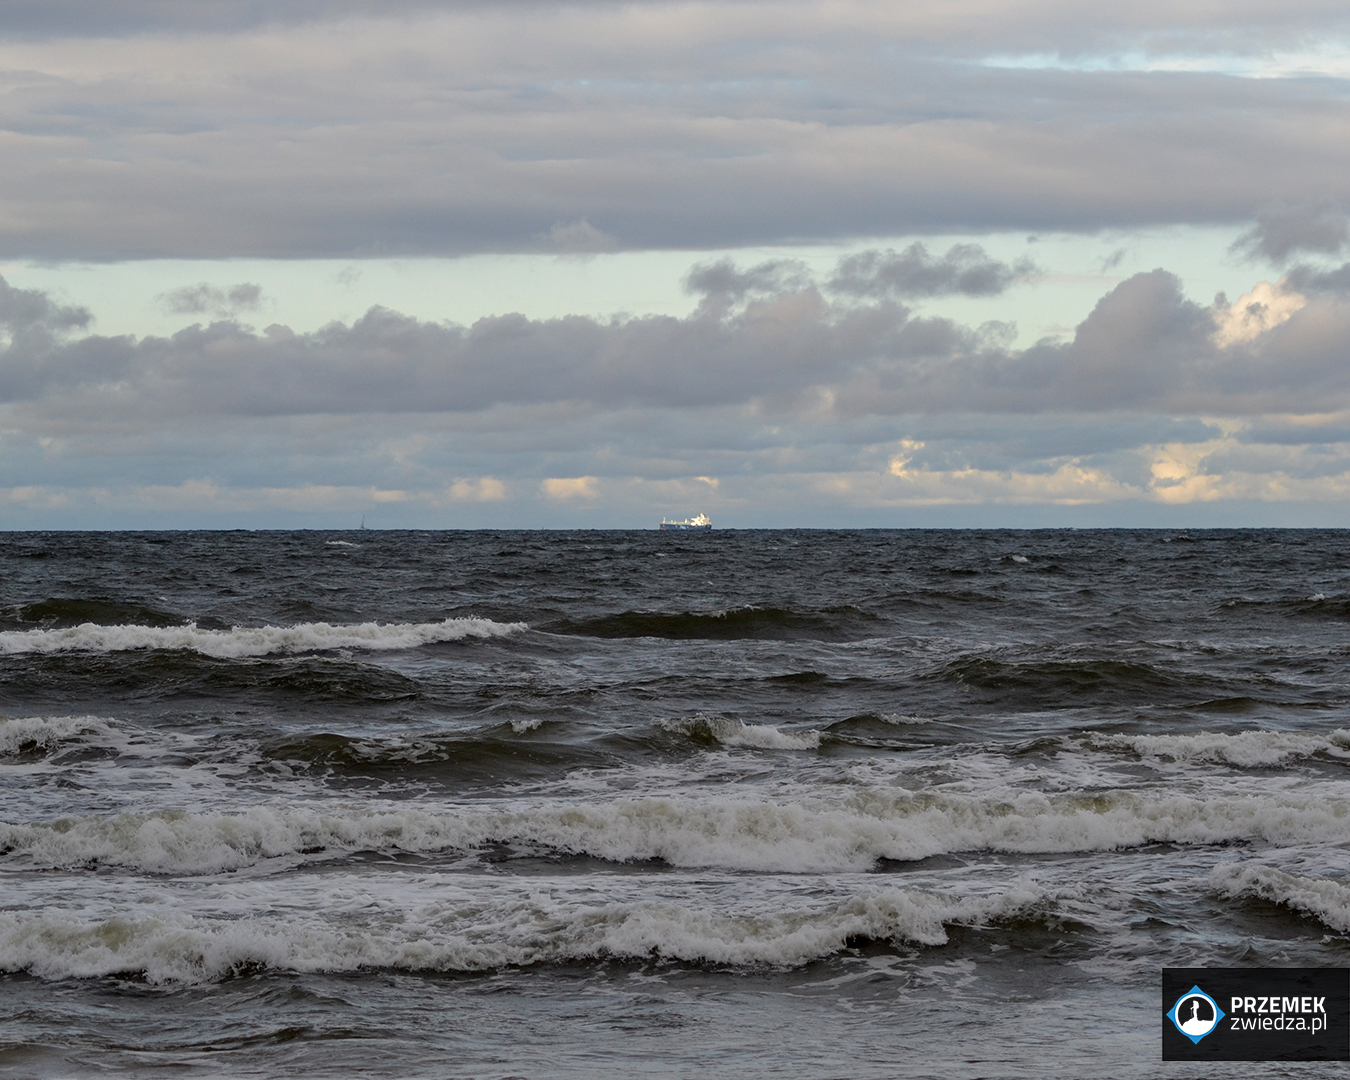 morze statek bałtyk biegus rdzawy